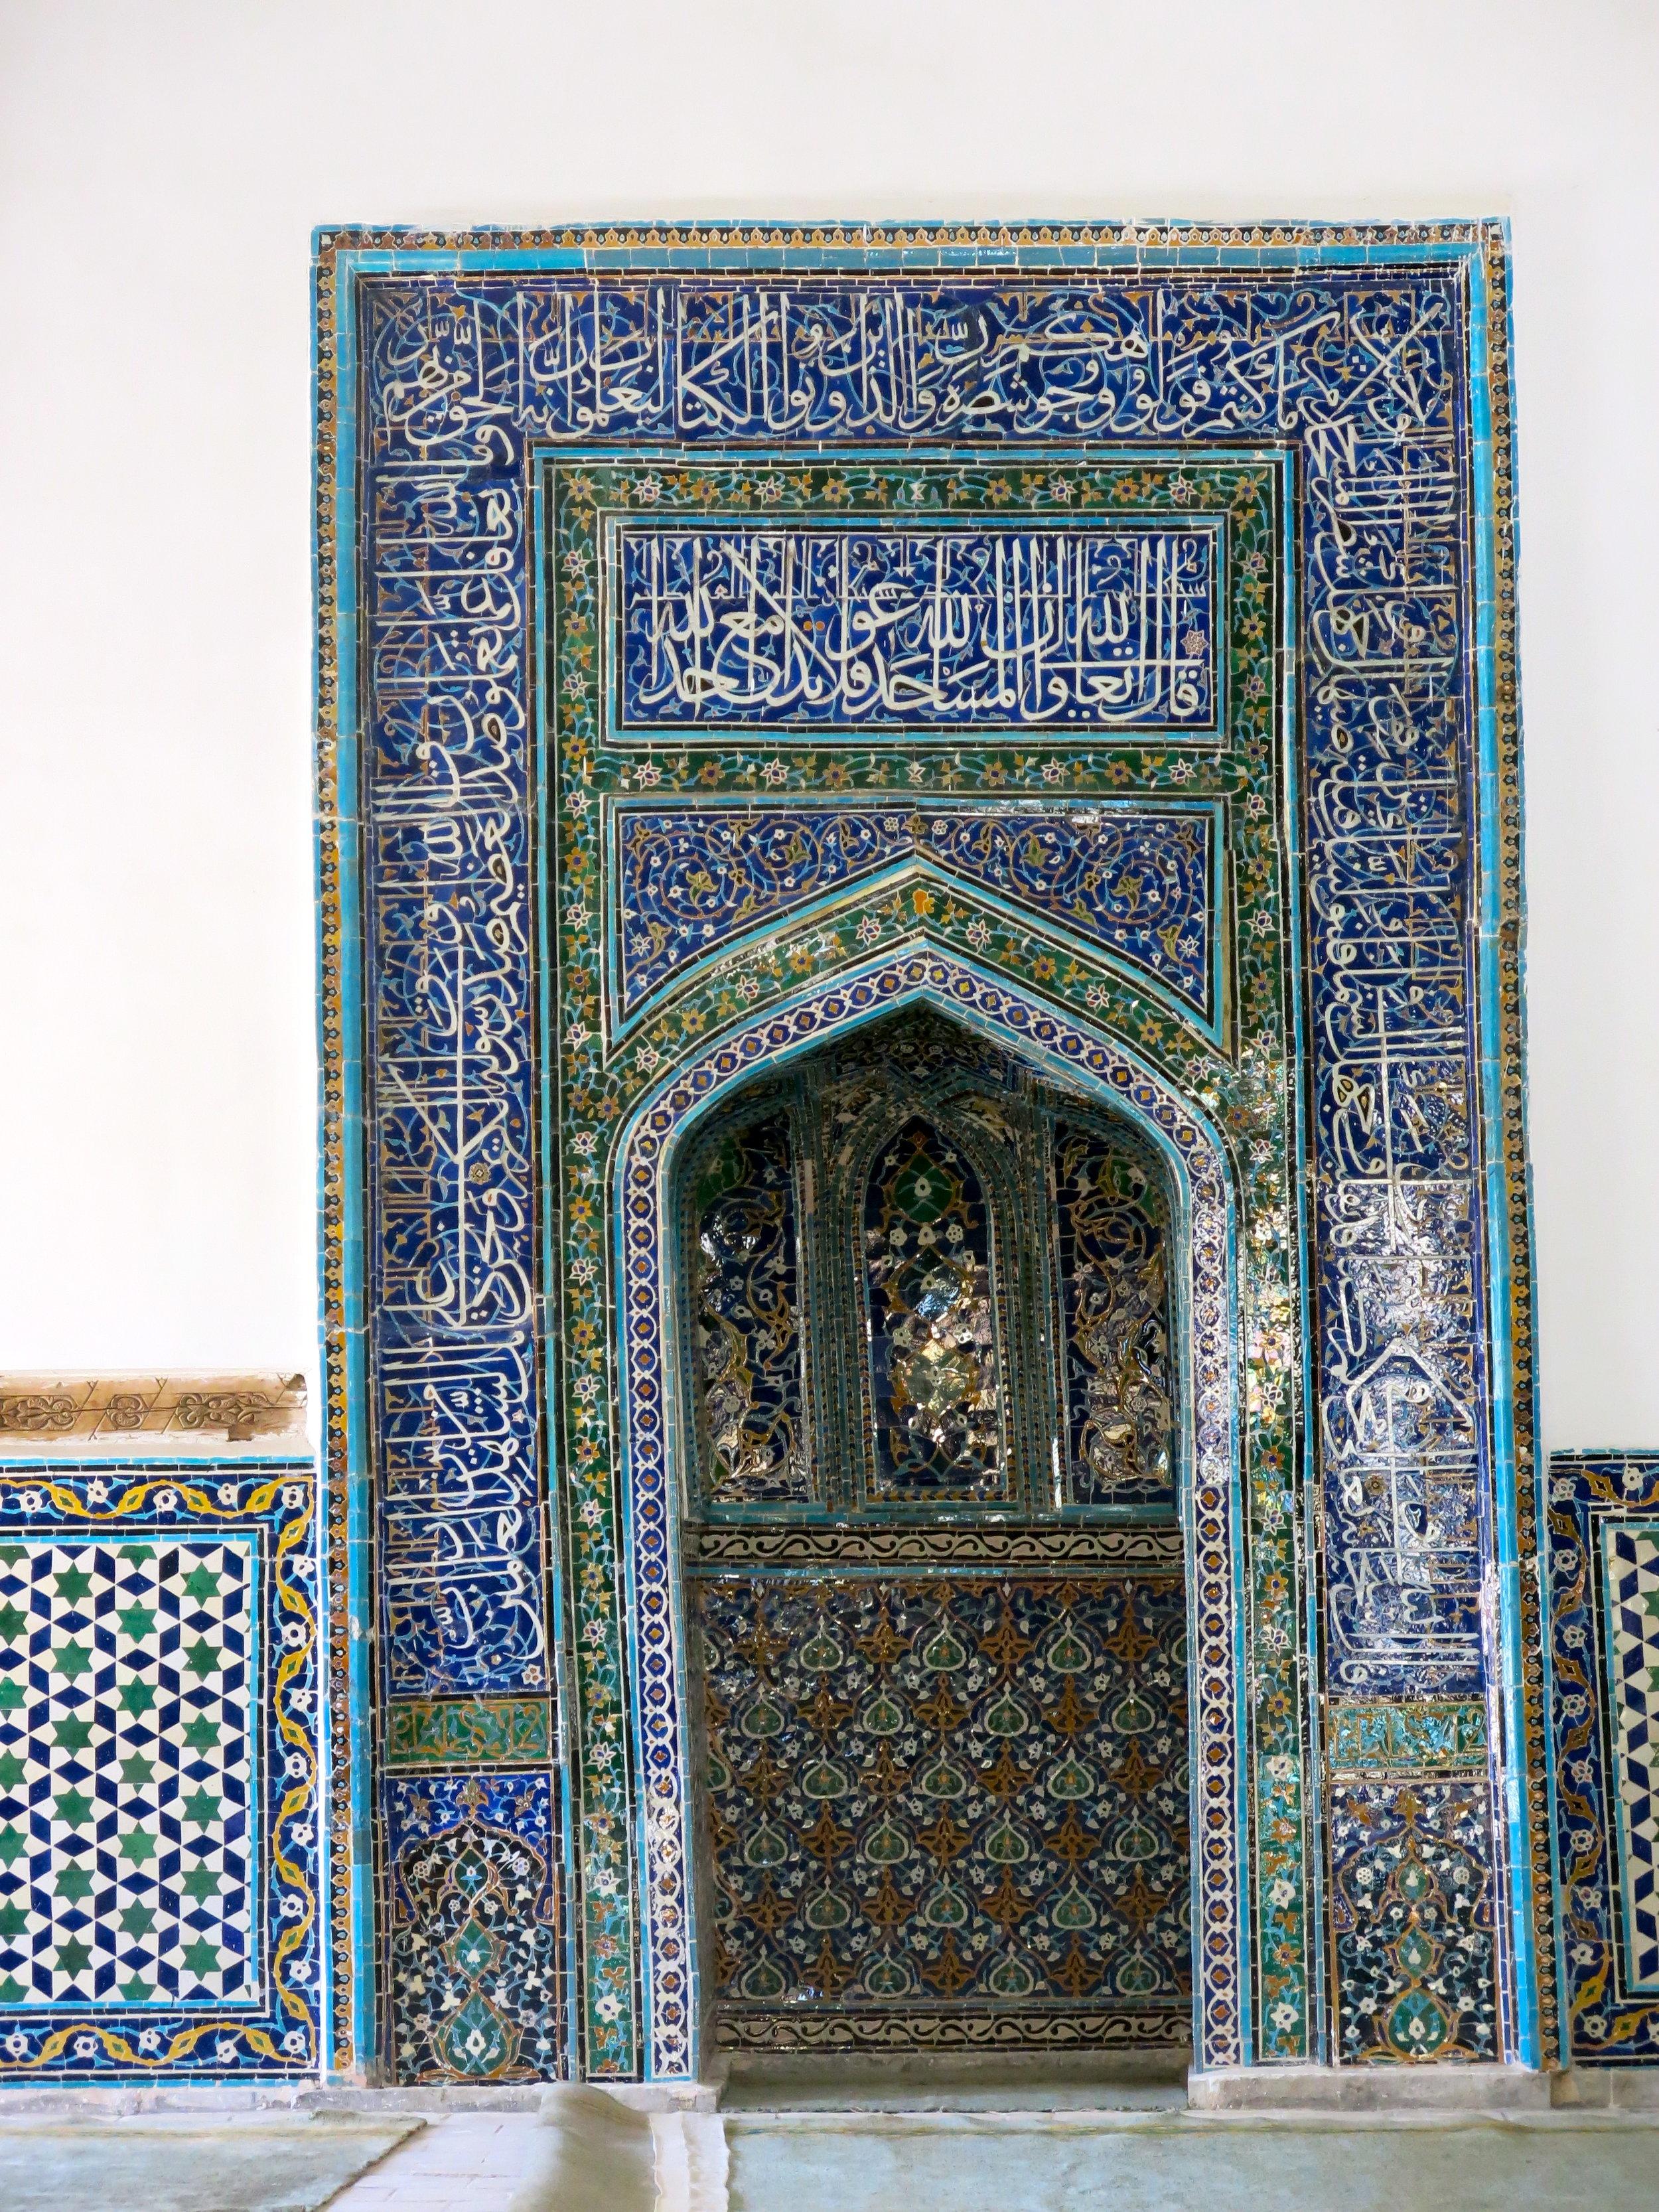 Arabic calligraphy on a mausoleum at Shah-i-Zinda